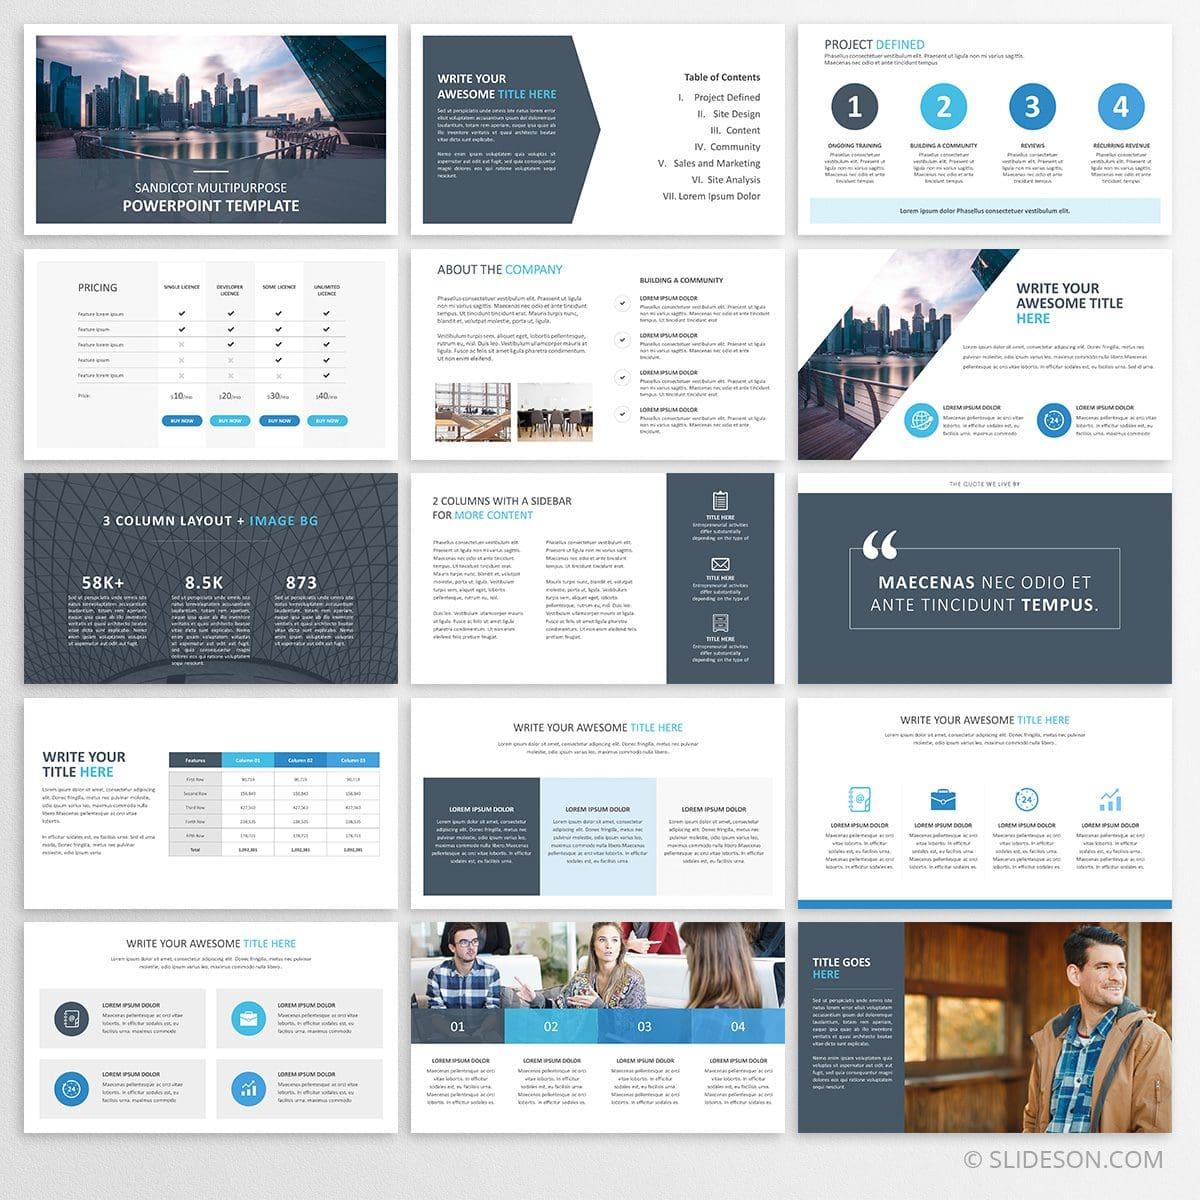 Sandicot Multipurpose PowerPoint Template